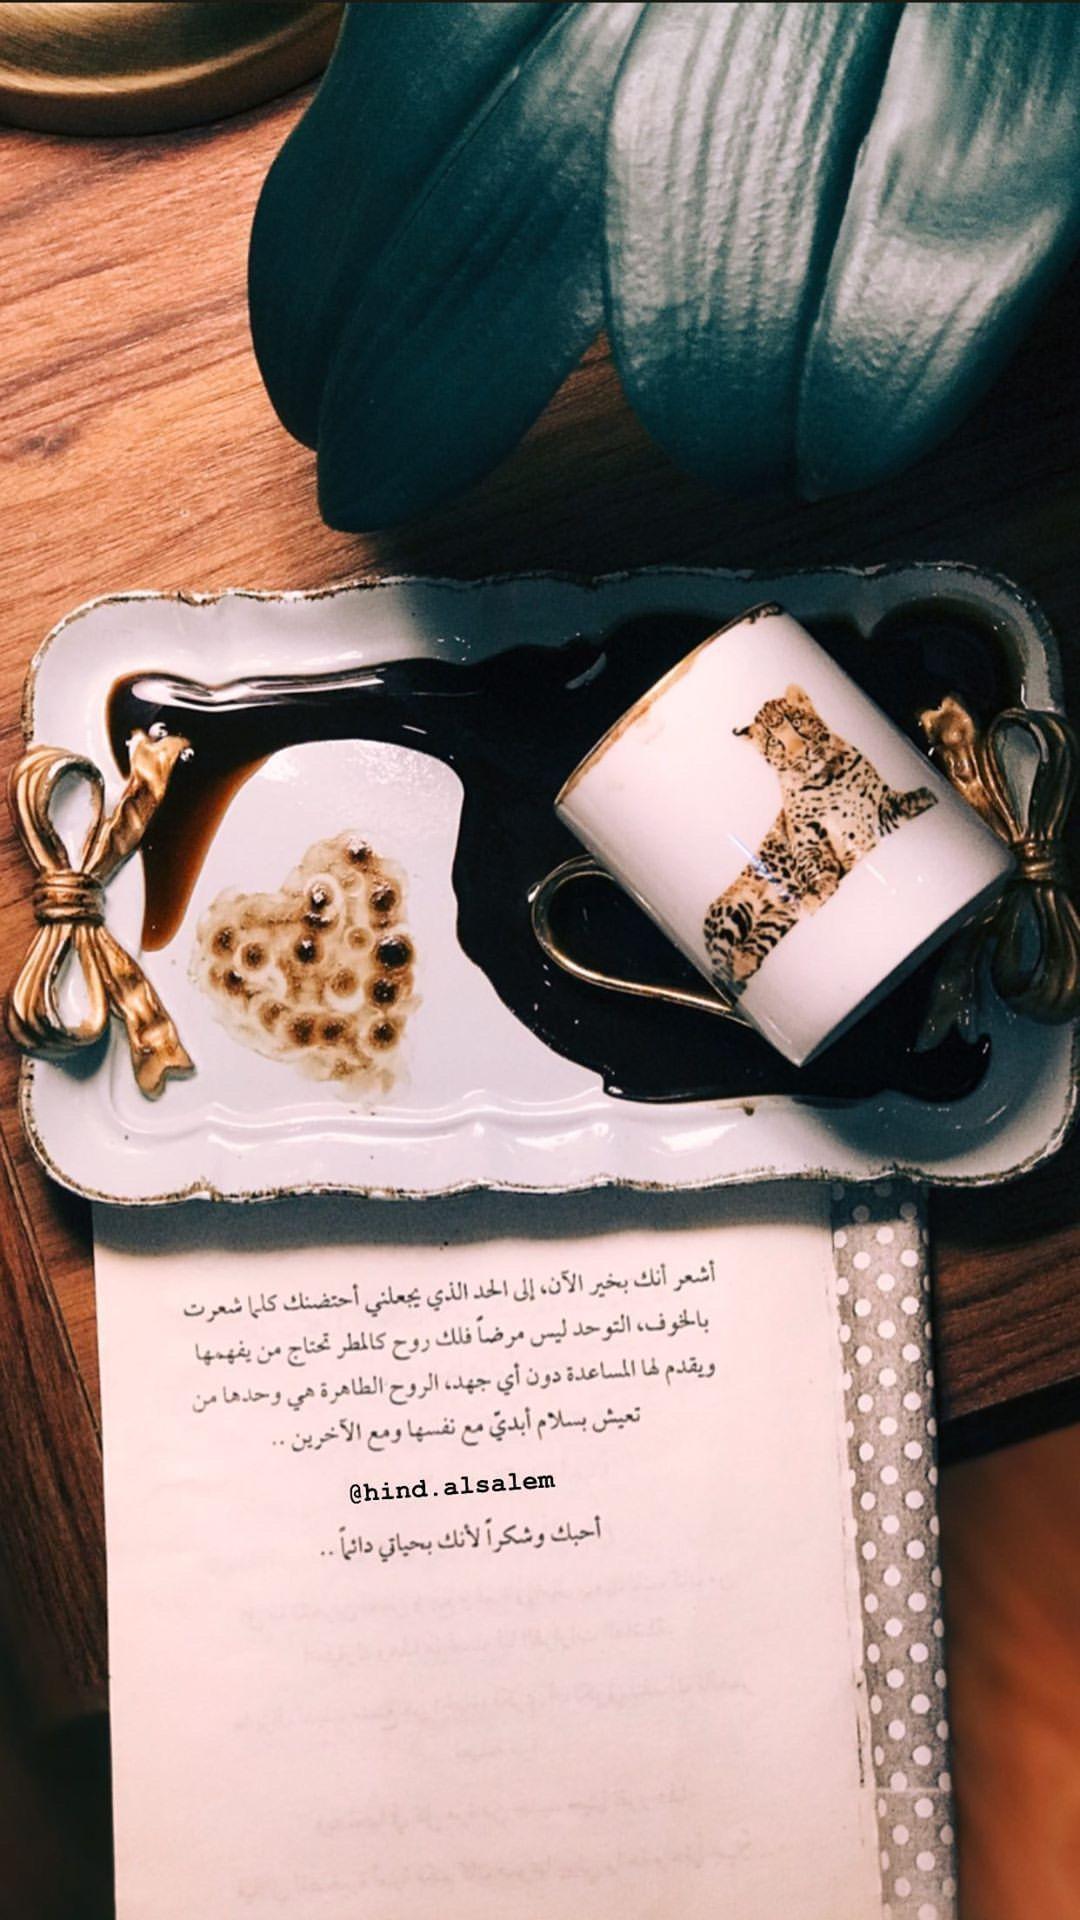 Photo Coffee Coffe Love Photography Lover Instagram Snap تصويري تصوير احترافي سناب صوره ابداع حب عشق Coffee Quotes Coffee Corner Arabic Quotes